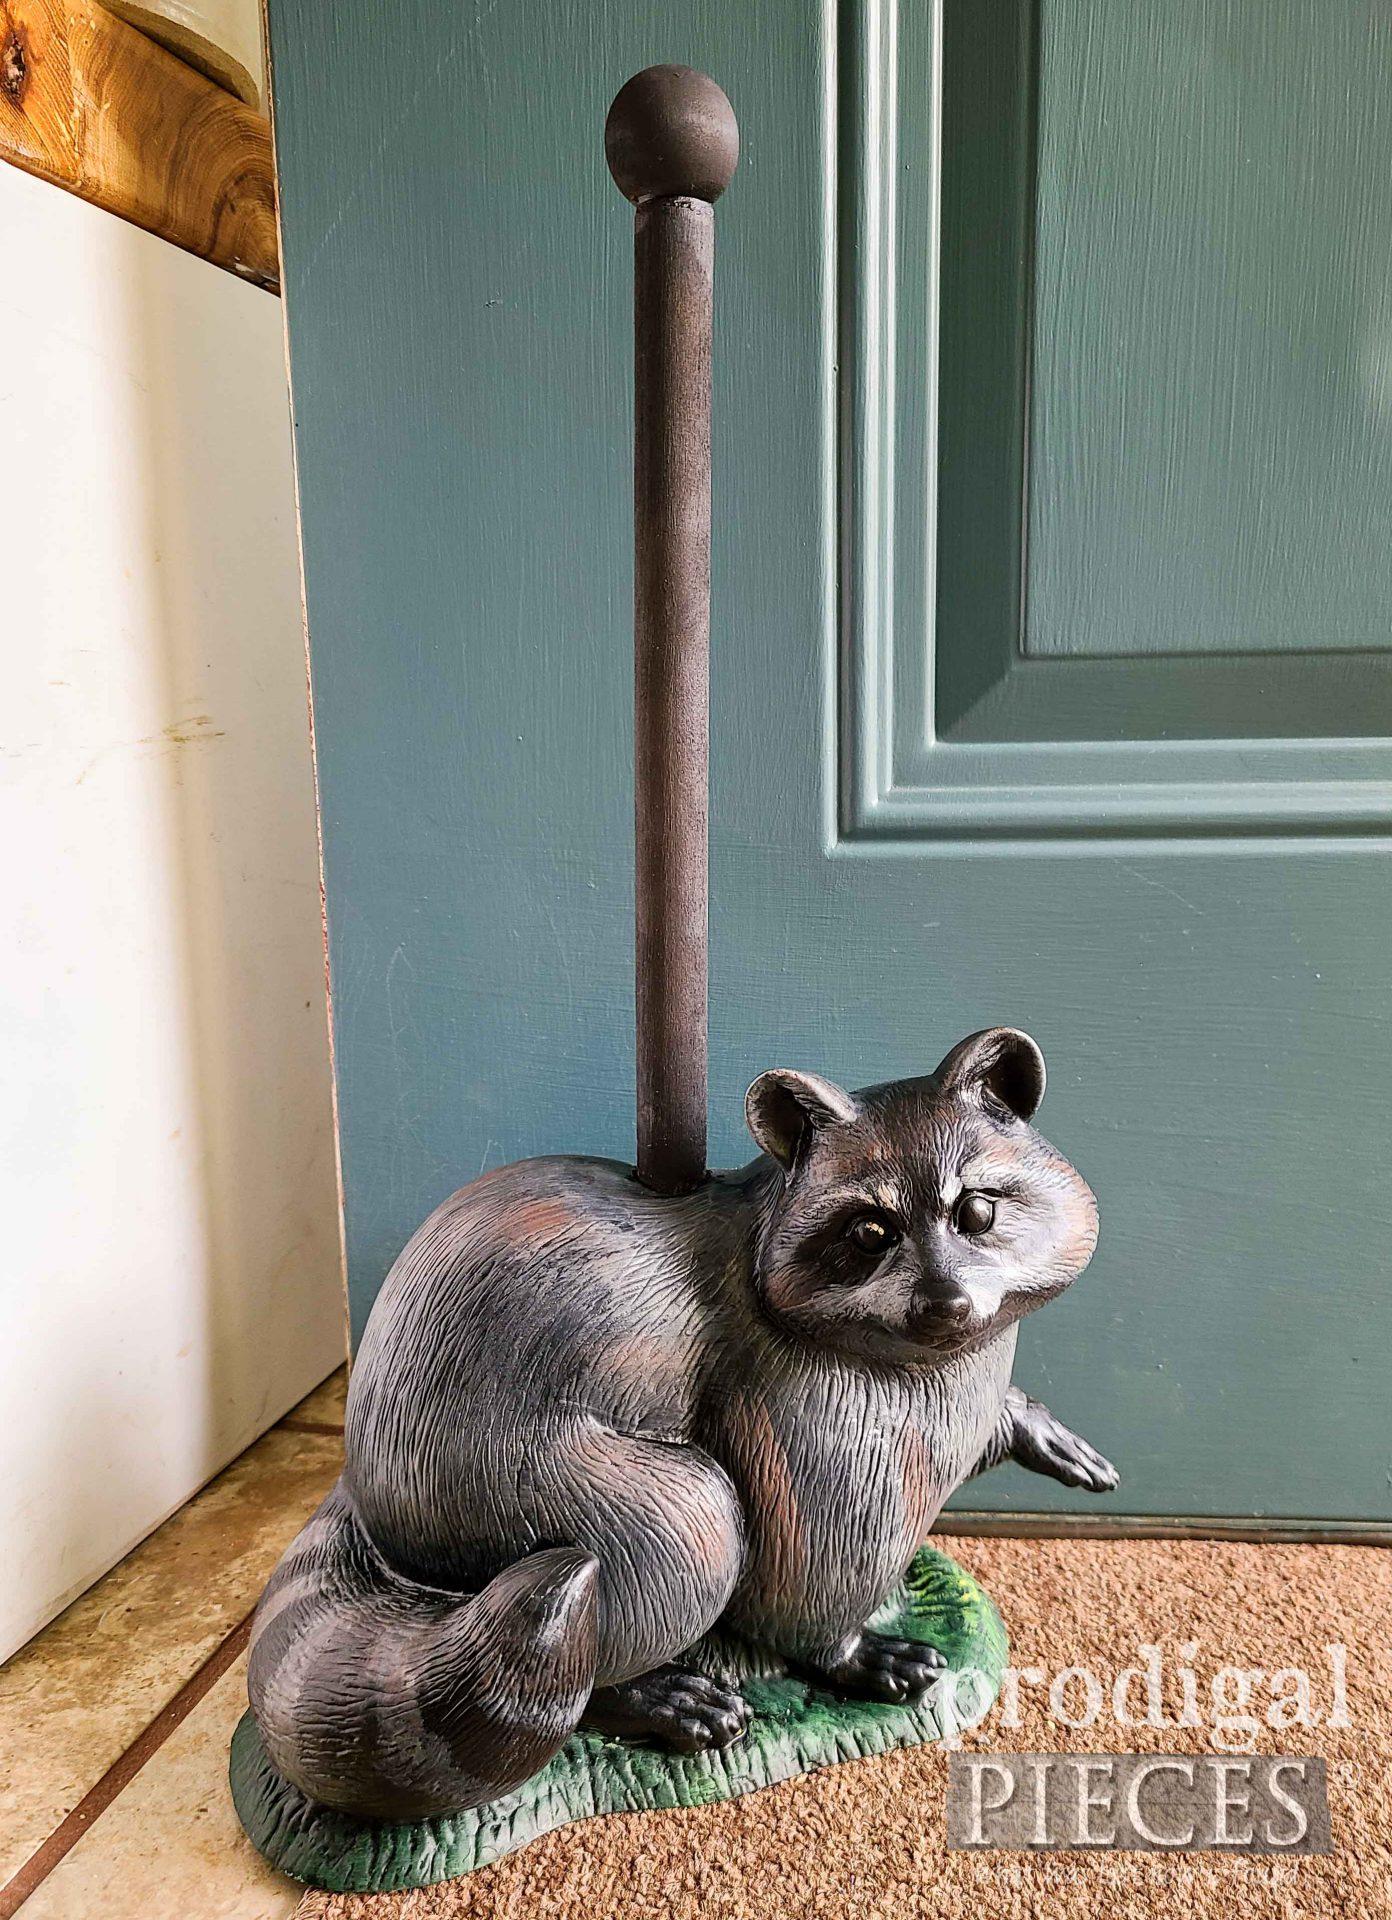 DIY Raccoon Upcycled Doorstop by Larissa of Prodigal Pieces | prodigalpieces.com #prodigalpieces #home #diy #farmhouse